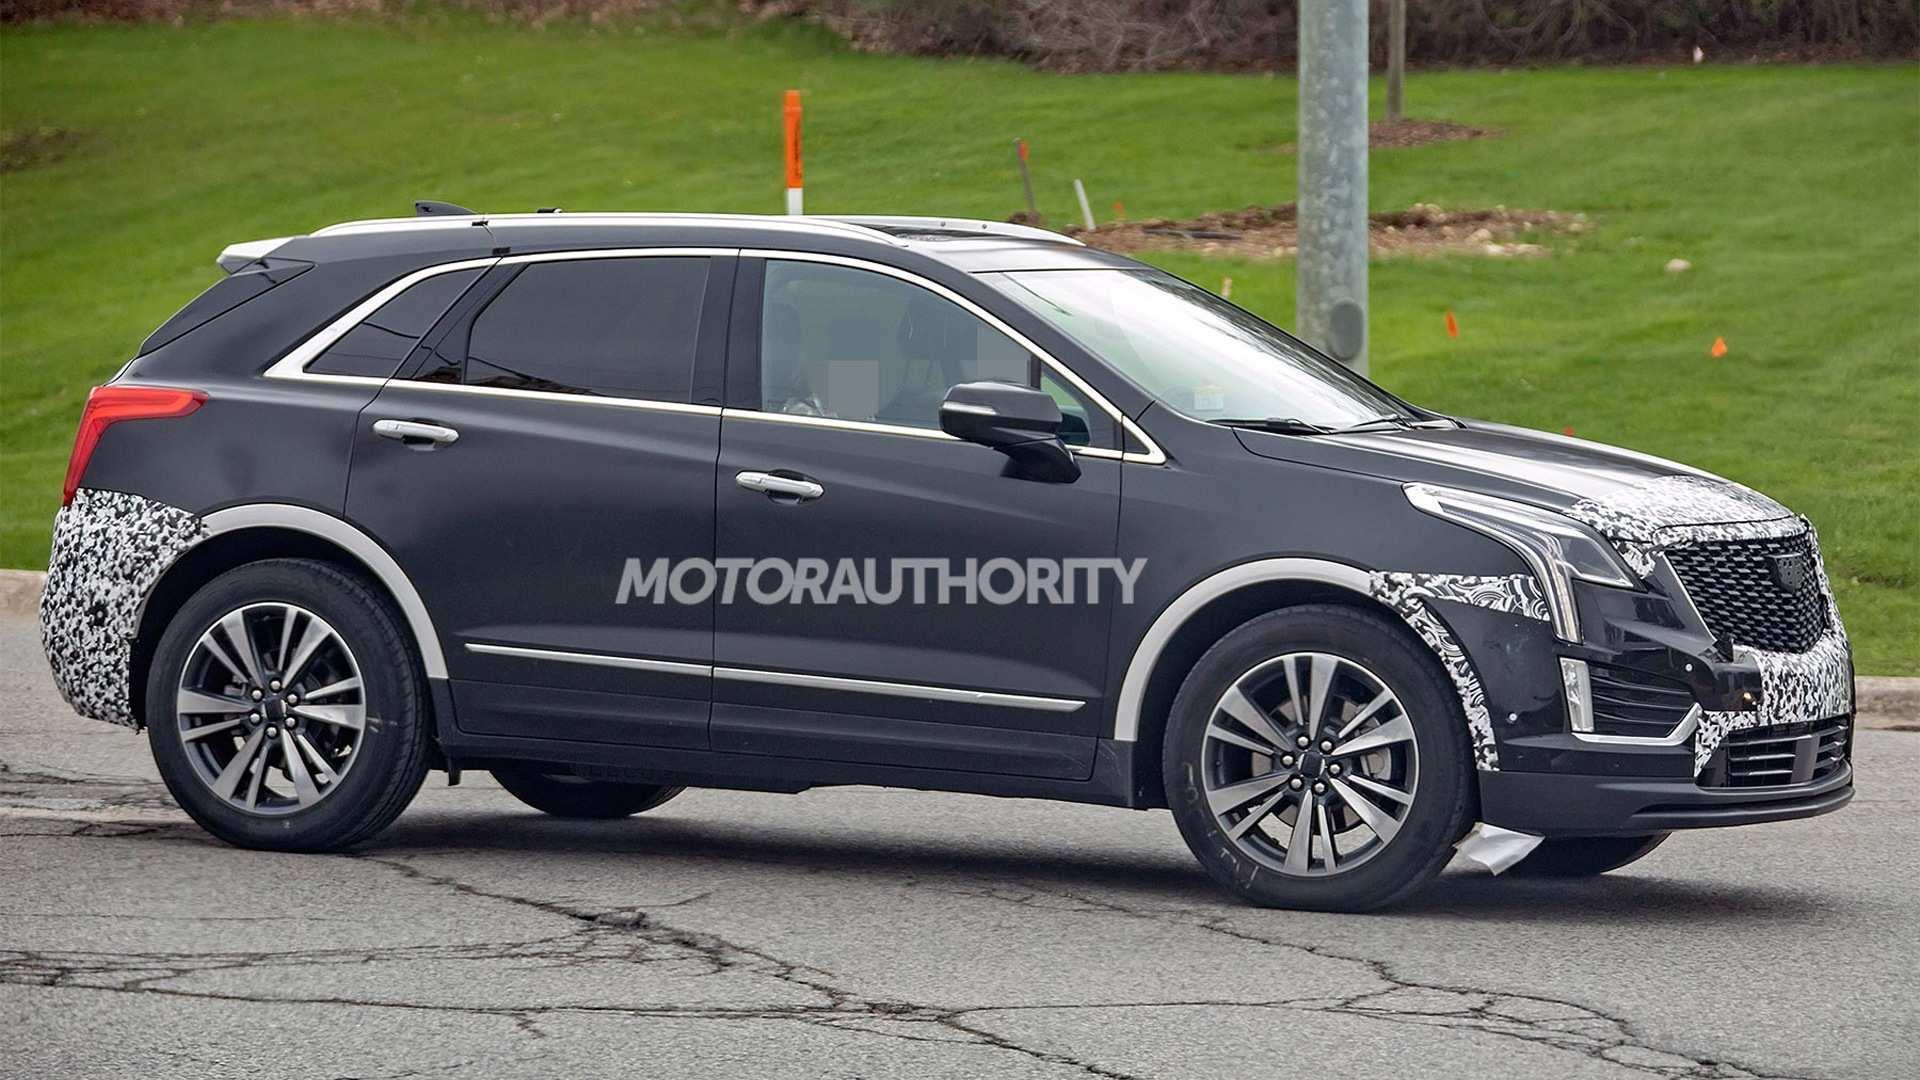 23 Great Cadillac Hybrid Suv 2020 History with Cadillac Hybrid Suv 2020